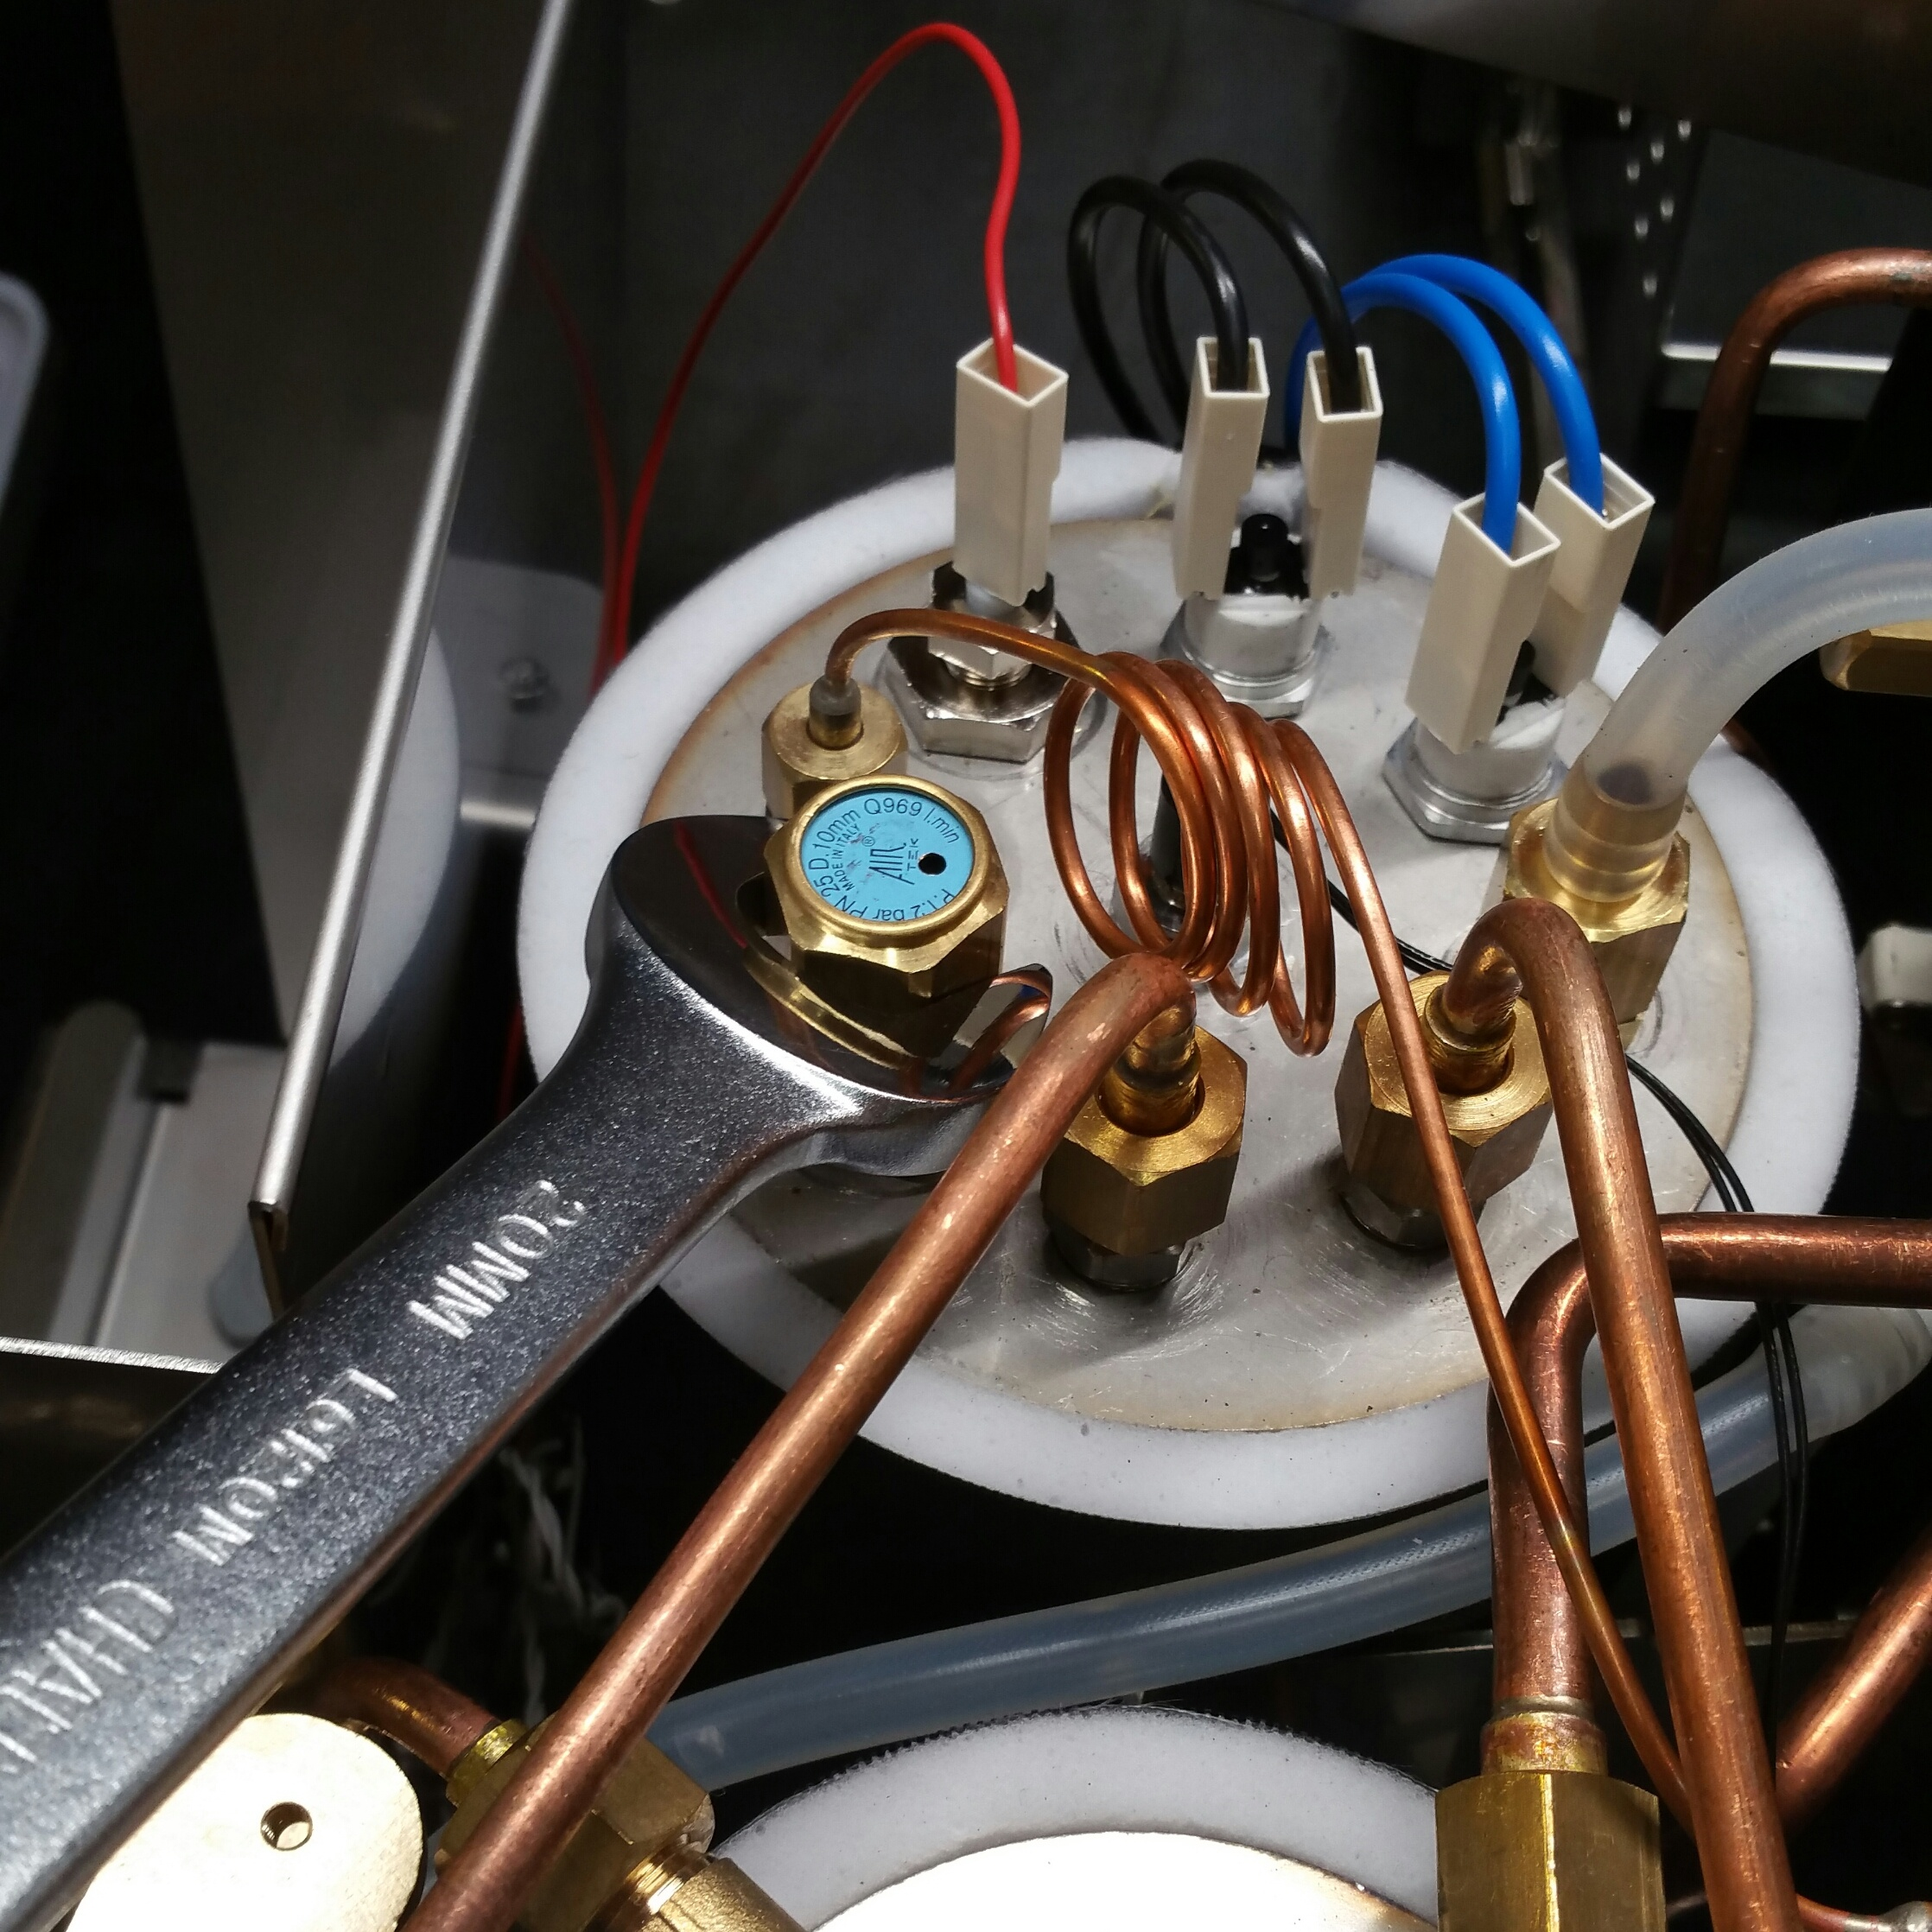 ECM Synchronika: Steam Boiler Pressure Safety Valve Replacement